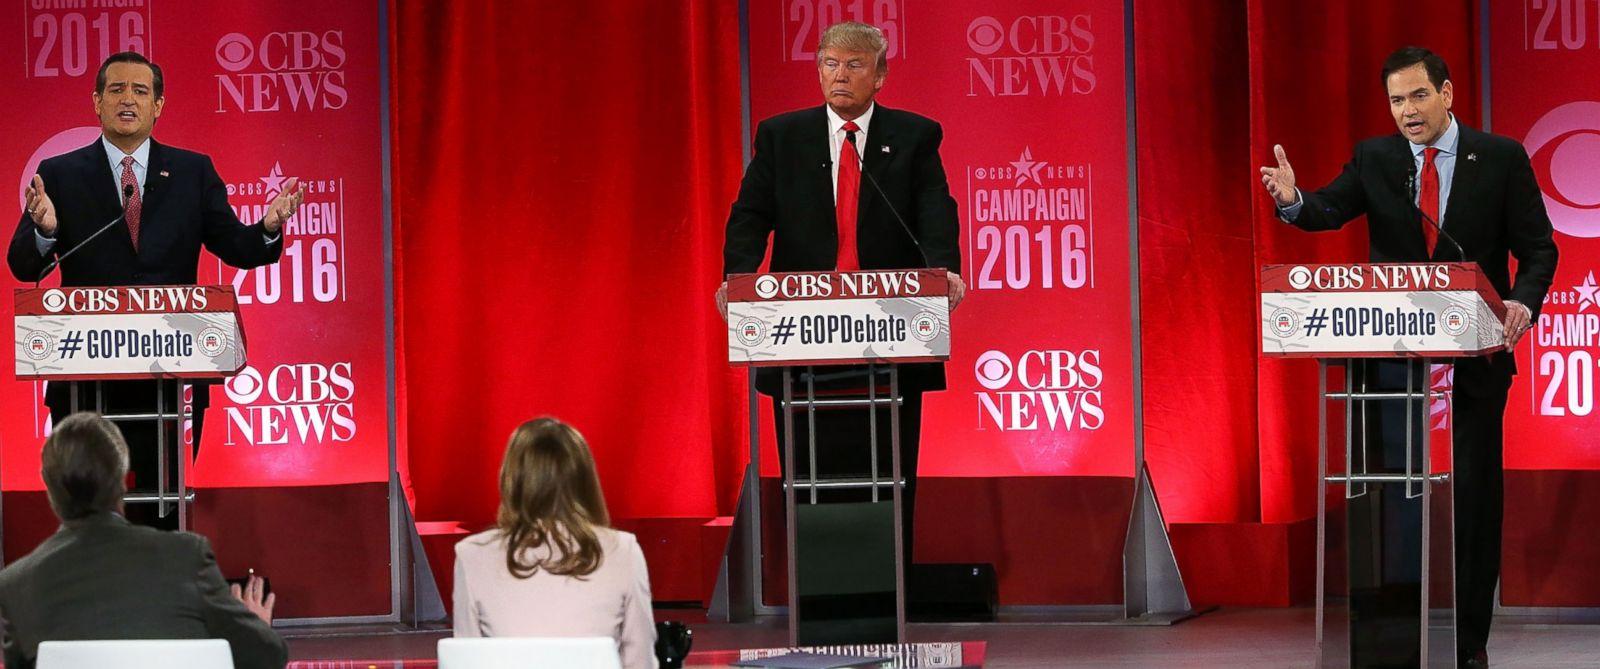 PHOTO: Republican presidential candidates Sen. Ted Cruz, Donald Trump and Sen. Marco Rubio participate in a CBS News GOP Debate on Feb. 13, 2016, at the Peace Center in Greenville, South Carolina.